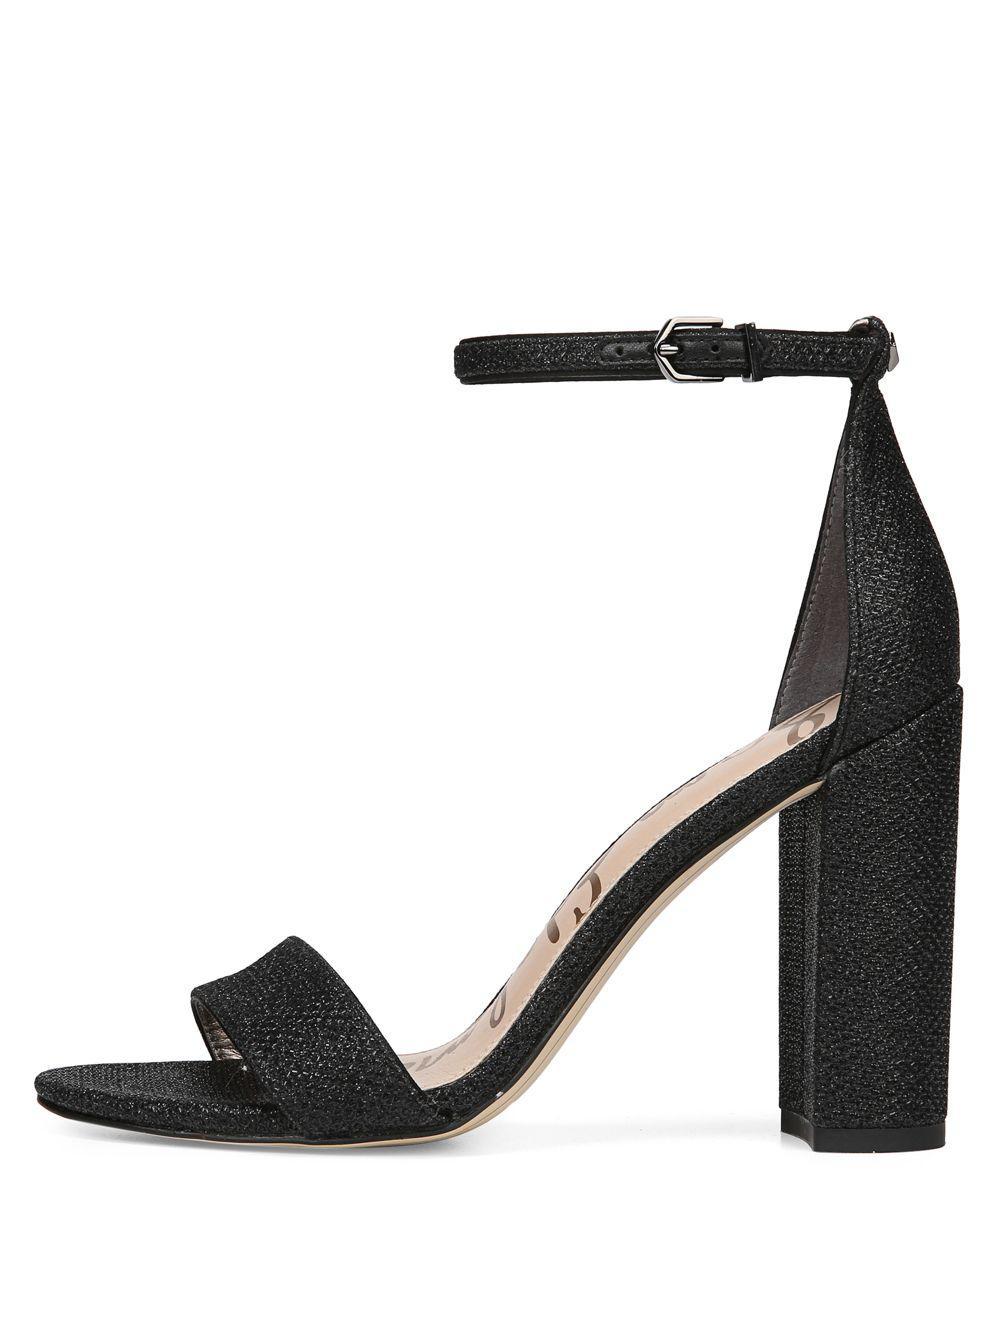 61e4cdaf44b Sam Edelman - Black Orient Express Yaro Leather Ankle-strap Sandals - Lyst.  View fullscreen